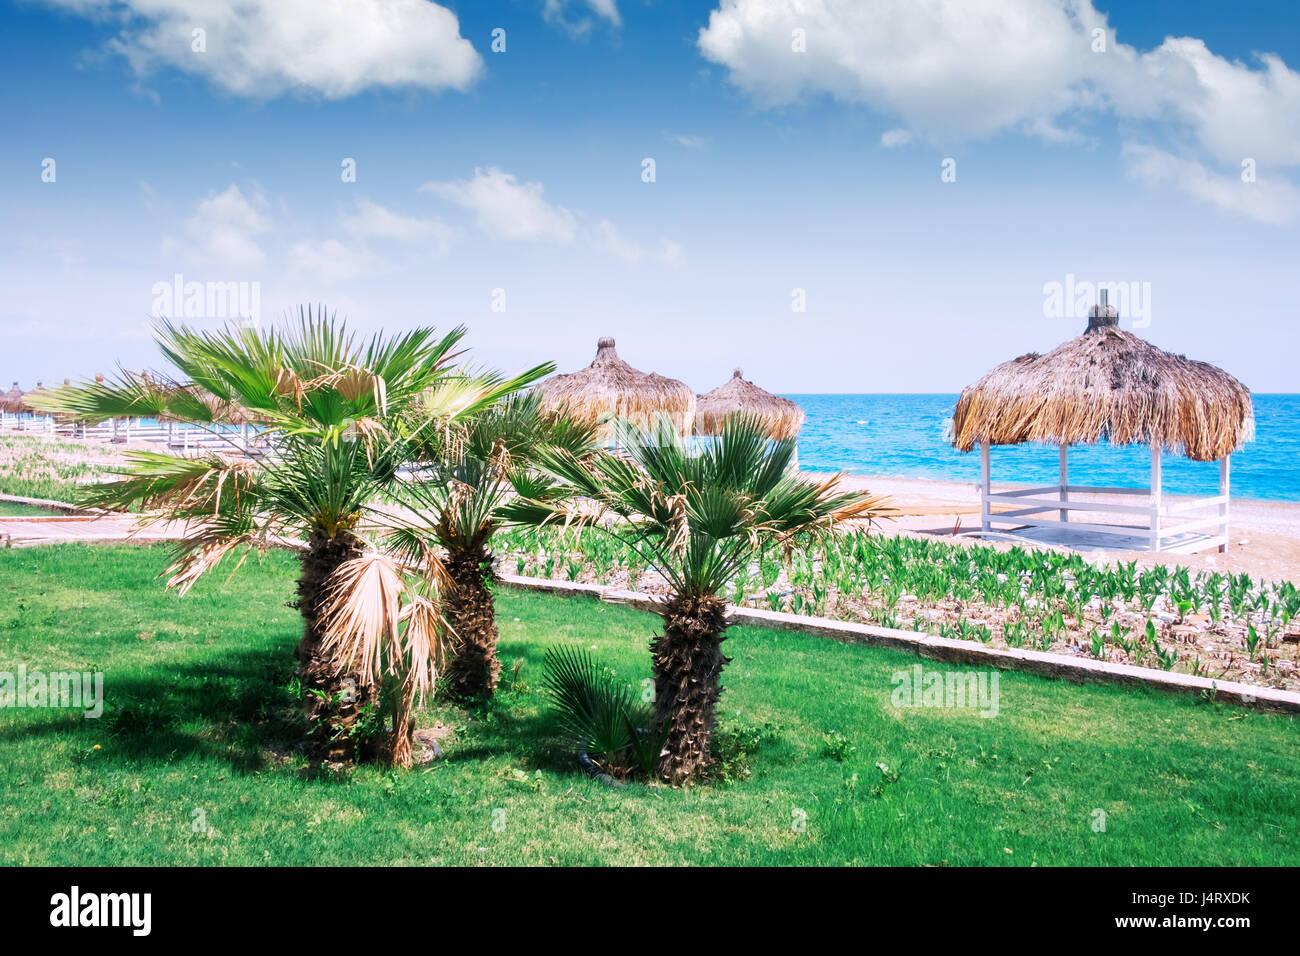 Summer arbors on beach. Breathtaking view on mediterranean sea. White wooden summerhouses on sunny day. Blue sky - Stock Image